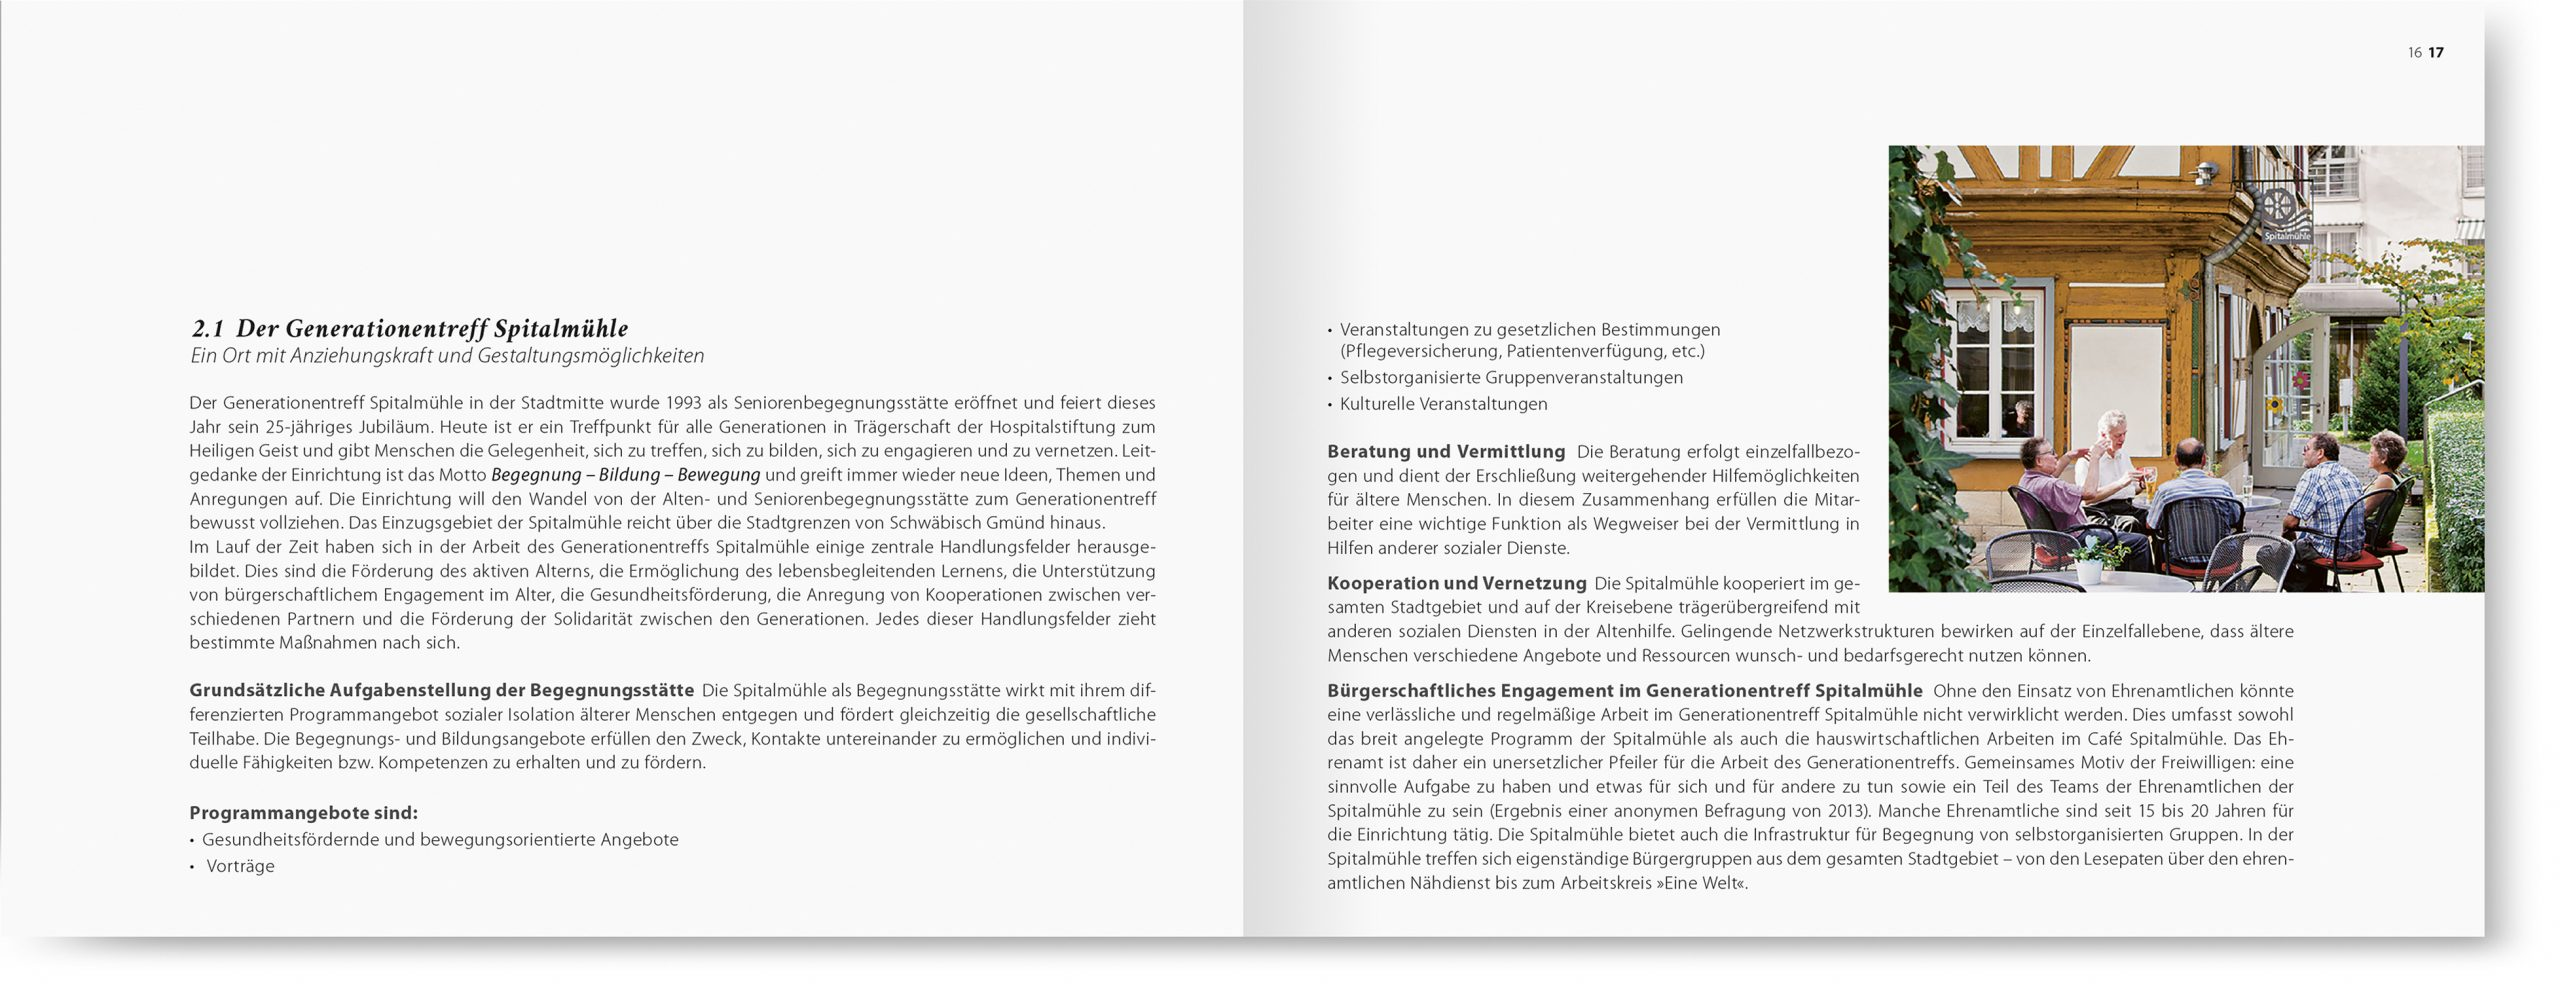 fh-web-seniorenkonzeption-3-scaled.jpg